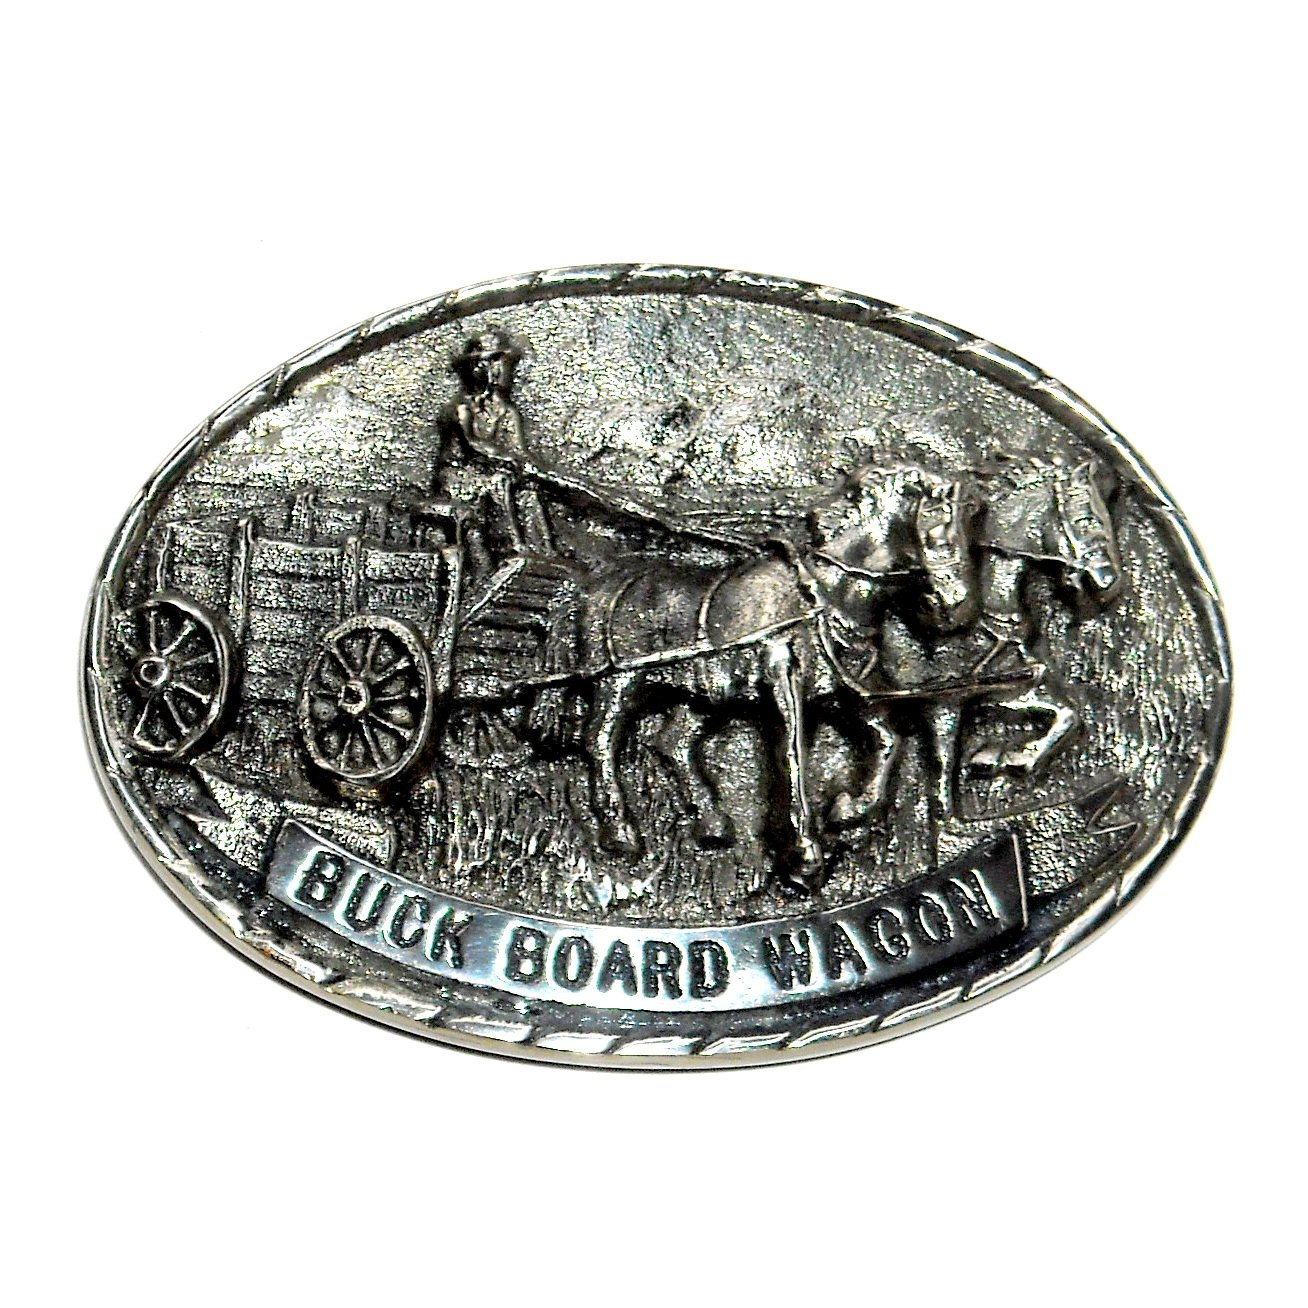 Buck Board Wagon 3D Tony Lama Vintage First Edition Brass Belt buckle